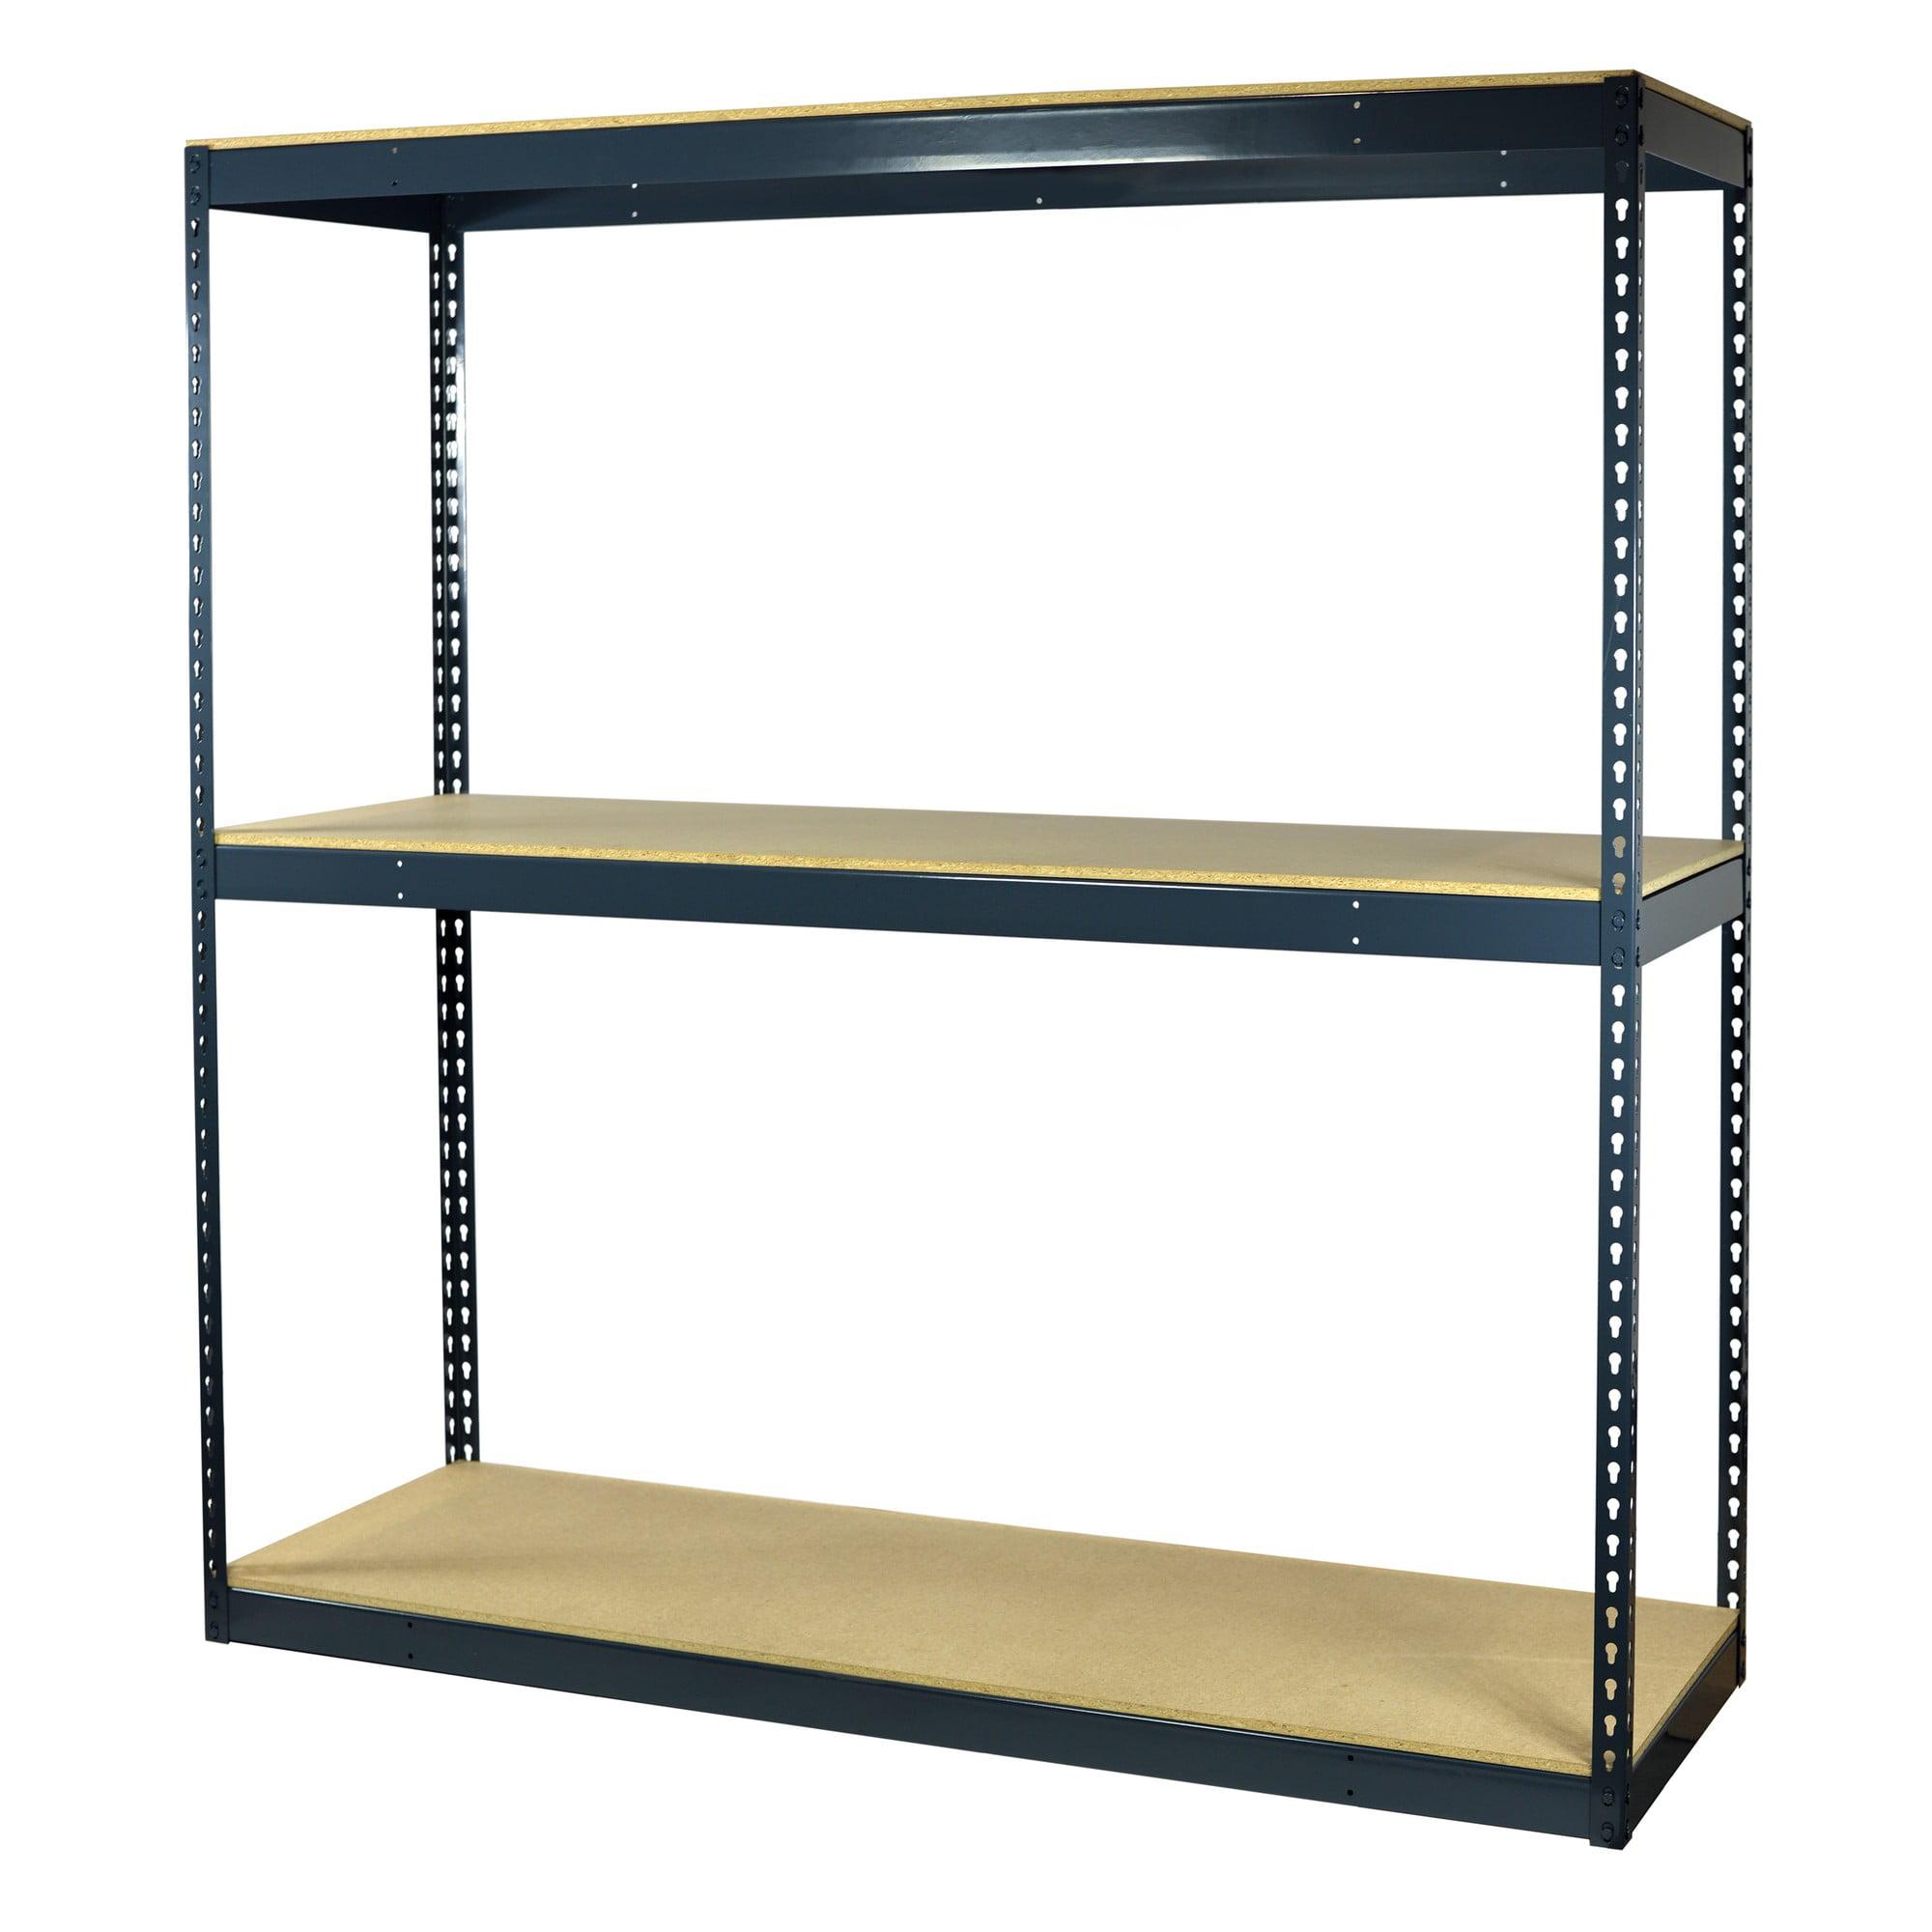 Storage Max Garage Shelving Boltless, 60 x 36 x 72, Heavy Duty, Double Rivet Beams, 3 Shelves